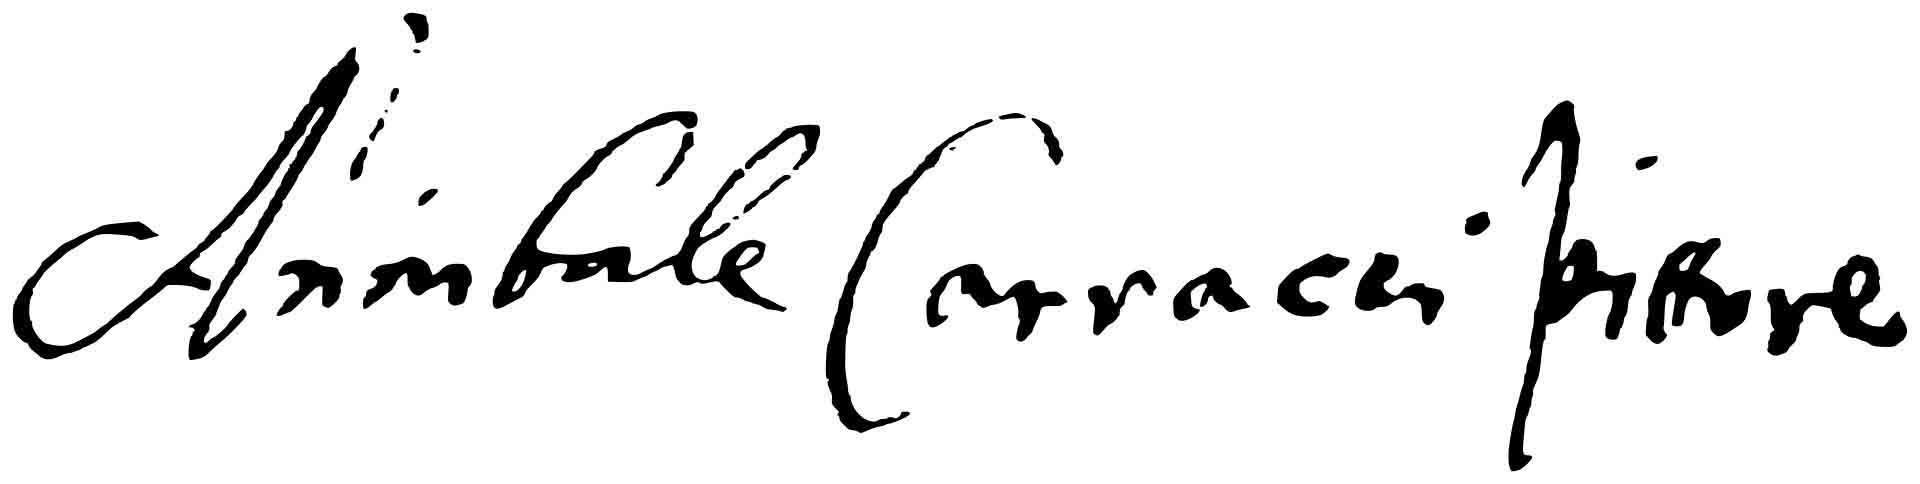 "Аннибале Карраччи (Annibale Carracci) ""Signature"""